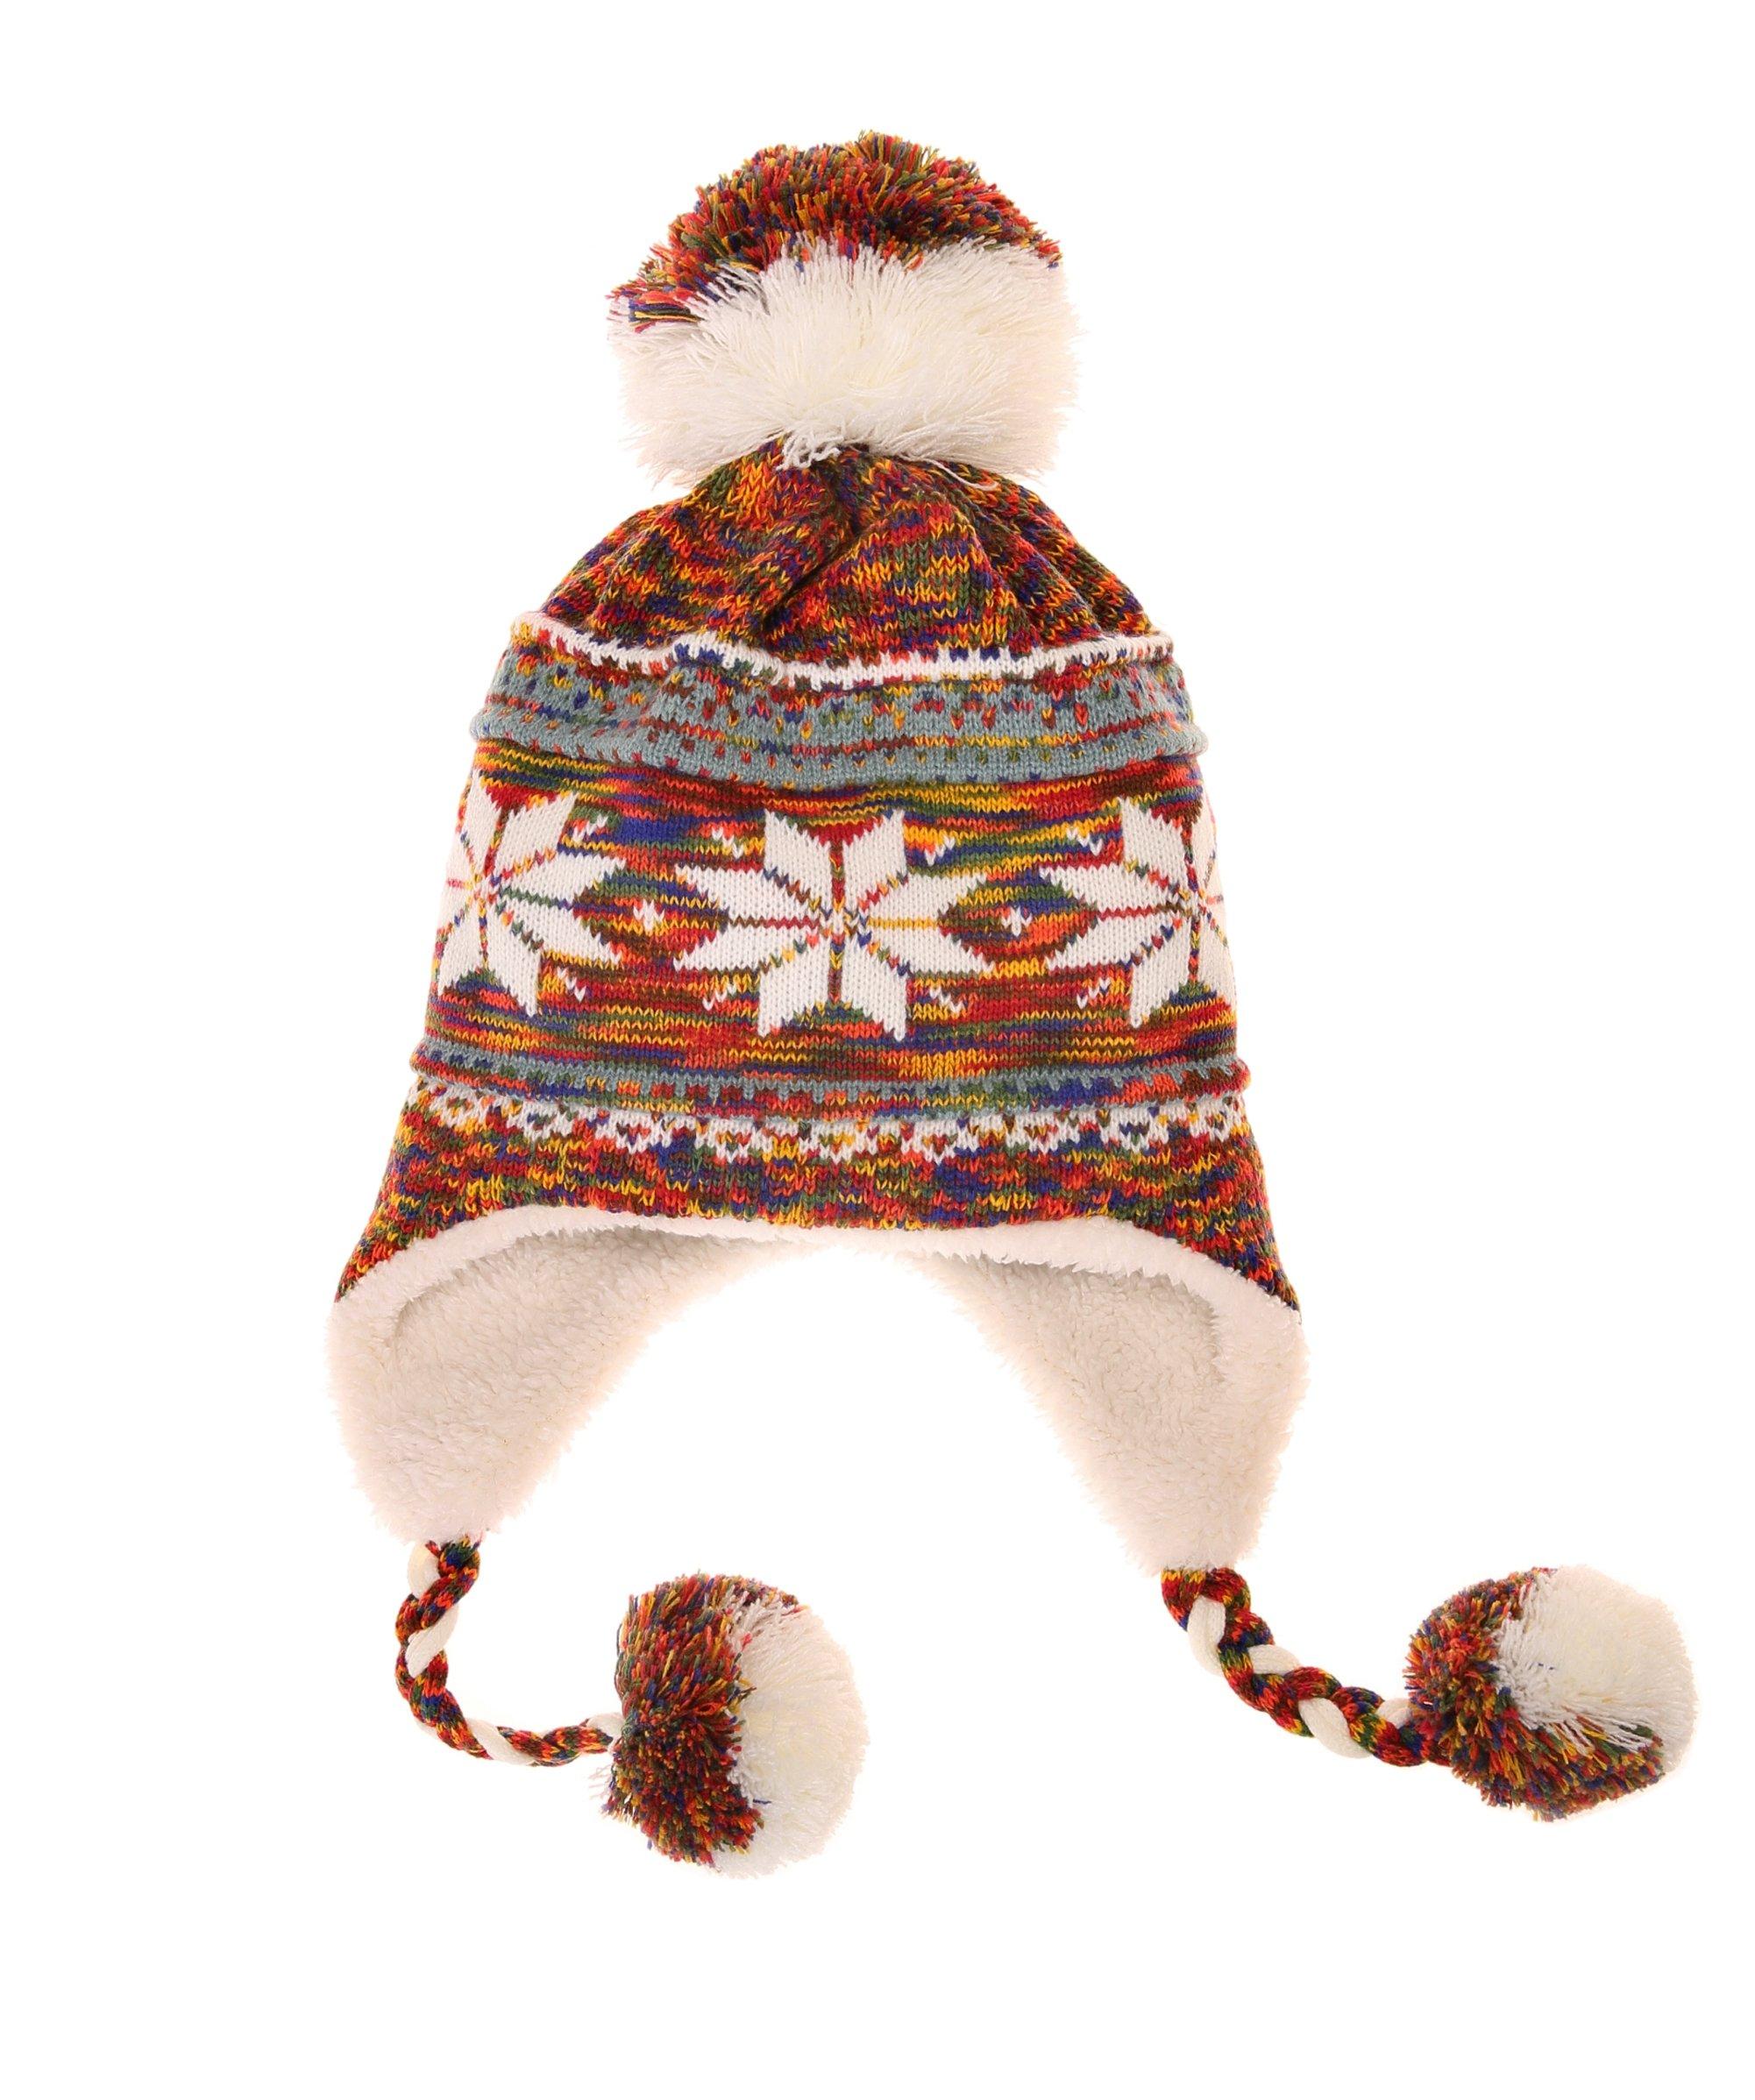 13f1867d1 Knit Hat Ear Flaps Pattern – Design Patterns